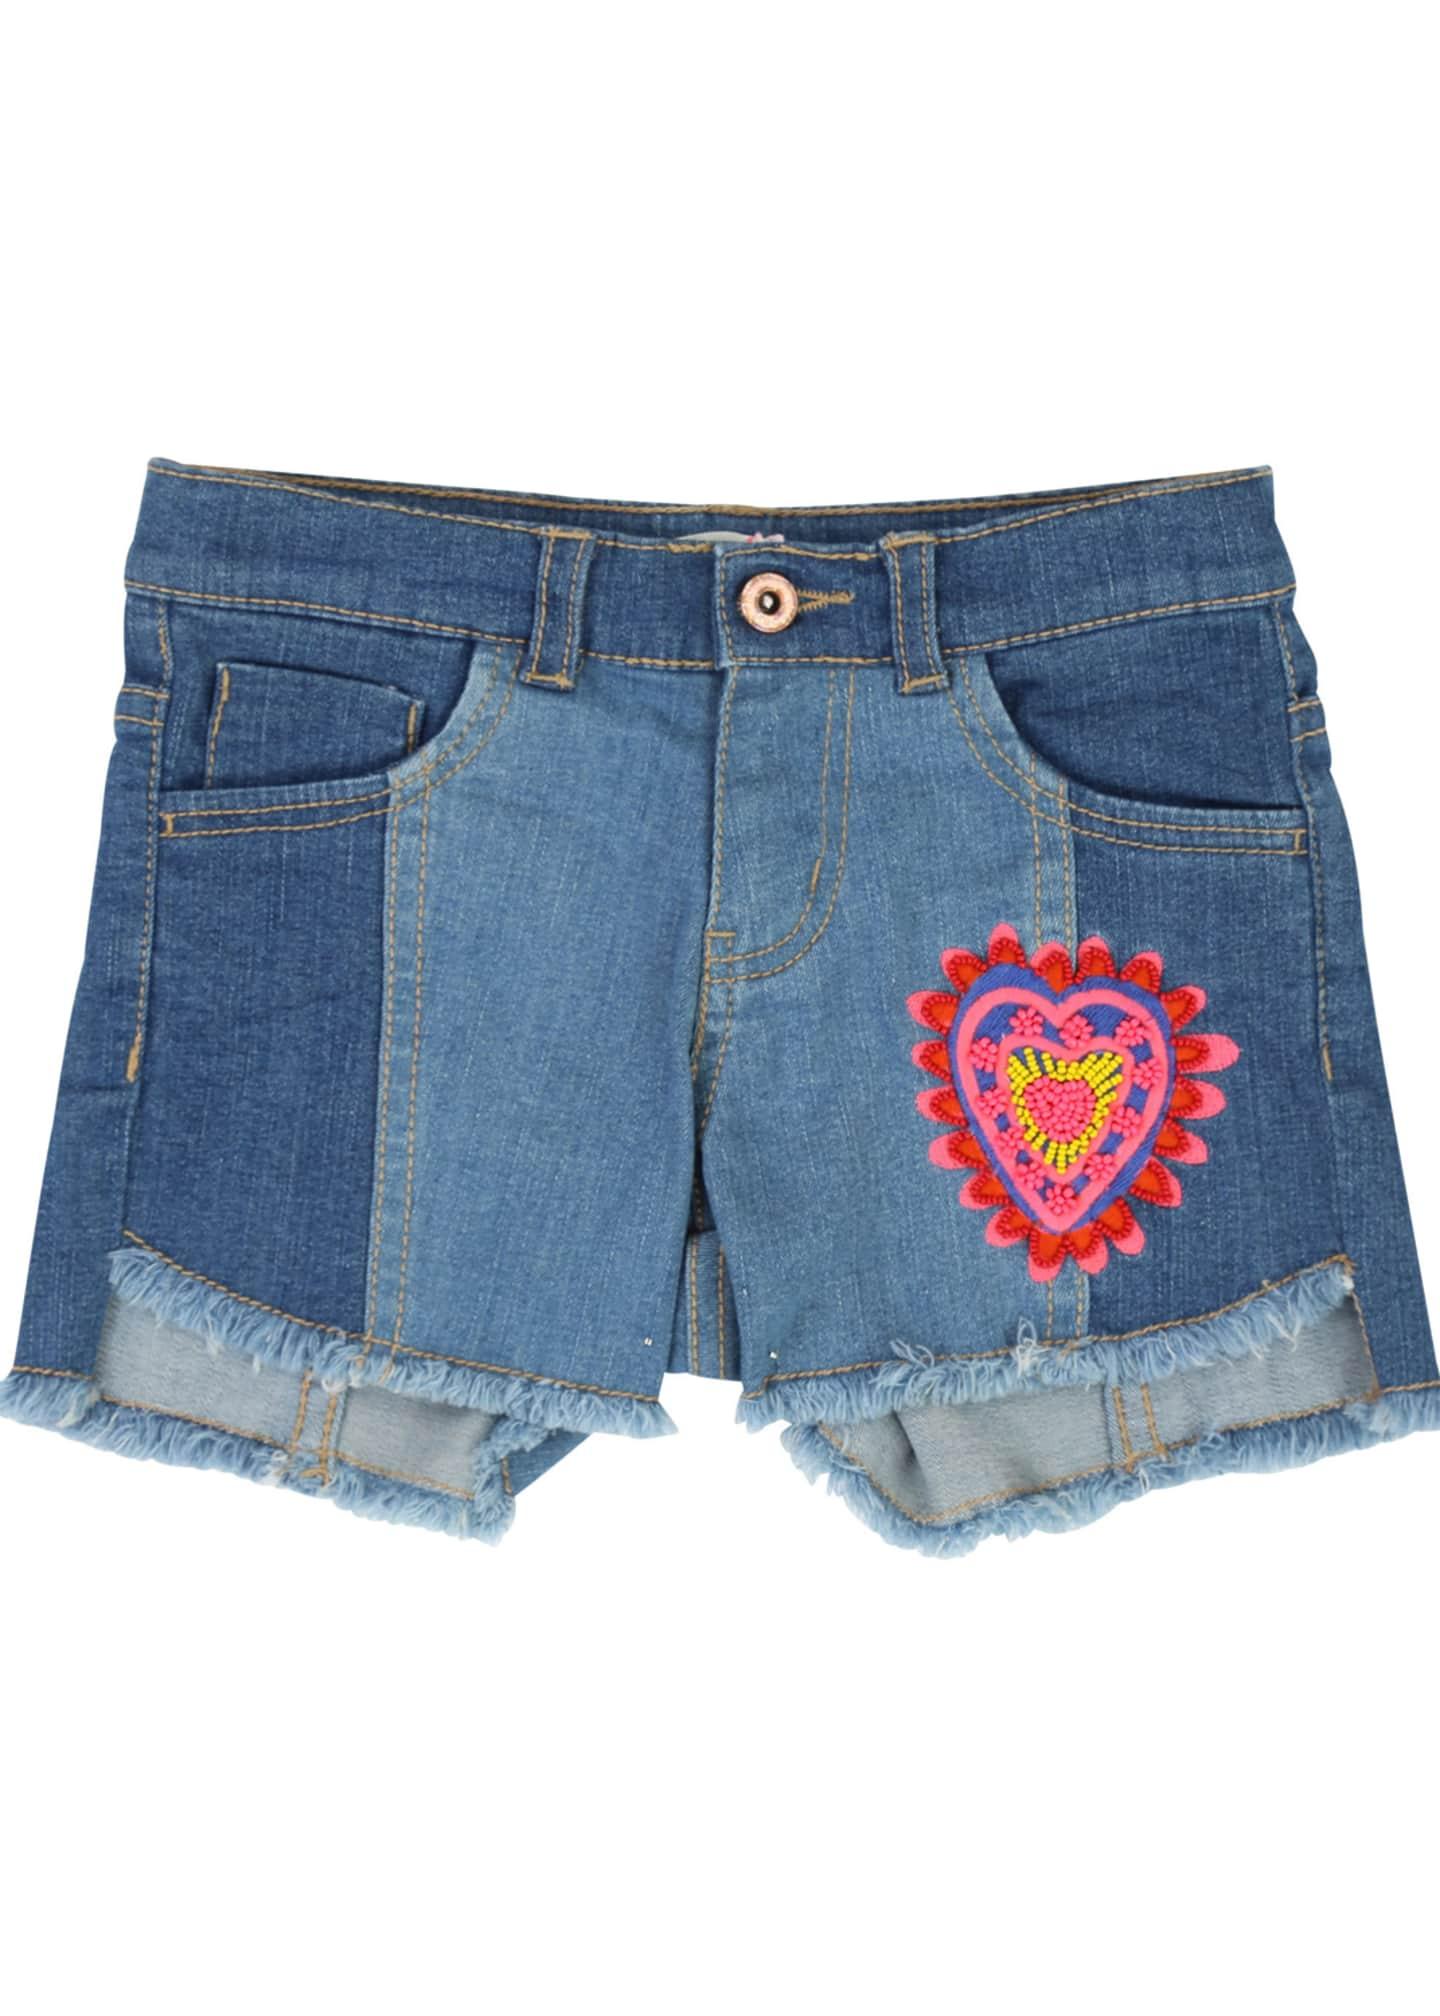 Billieblush Two-Tone Raw-Hem Denim Shorts w/ Heart Patch,